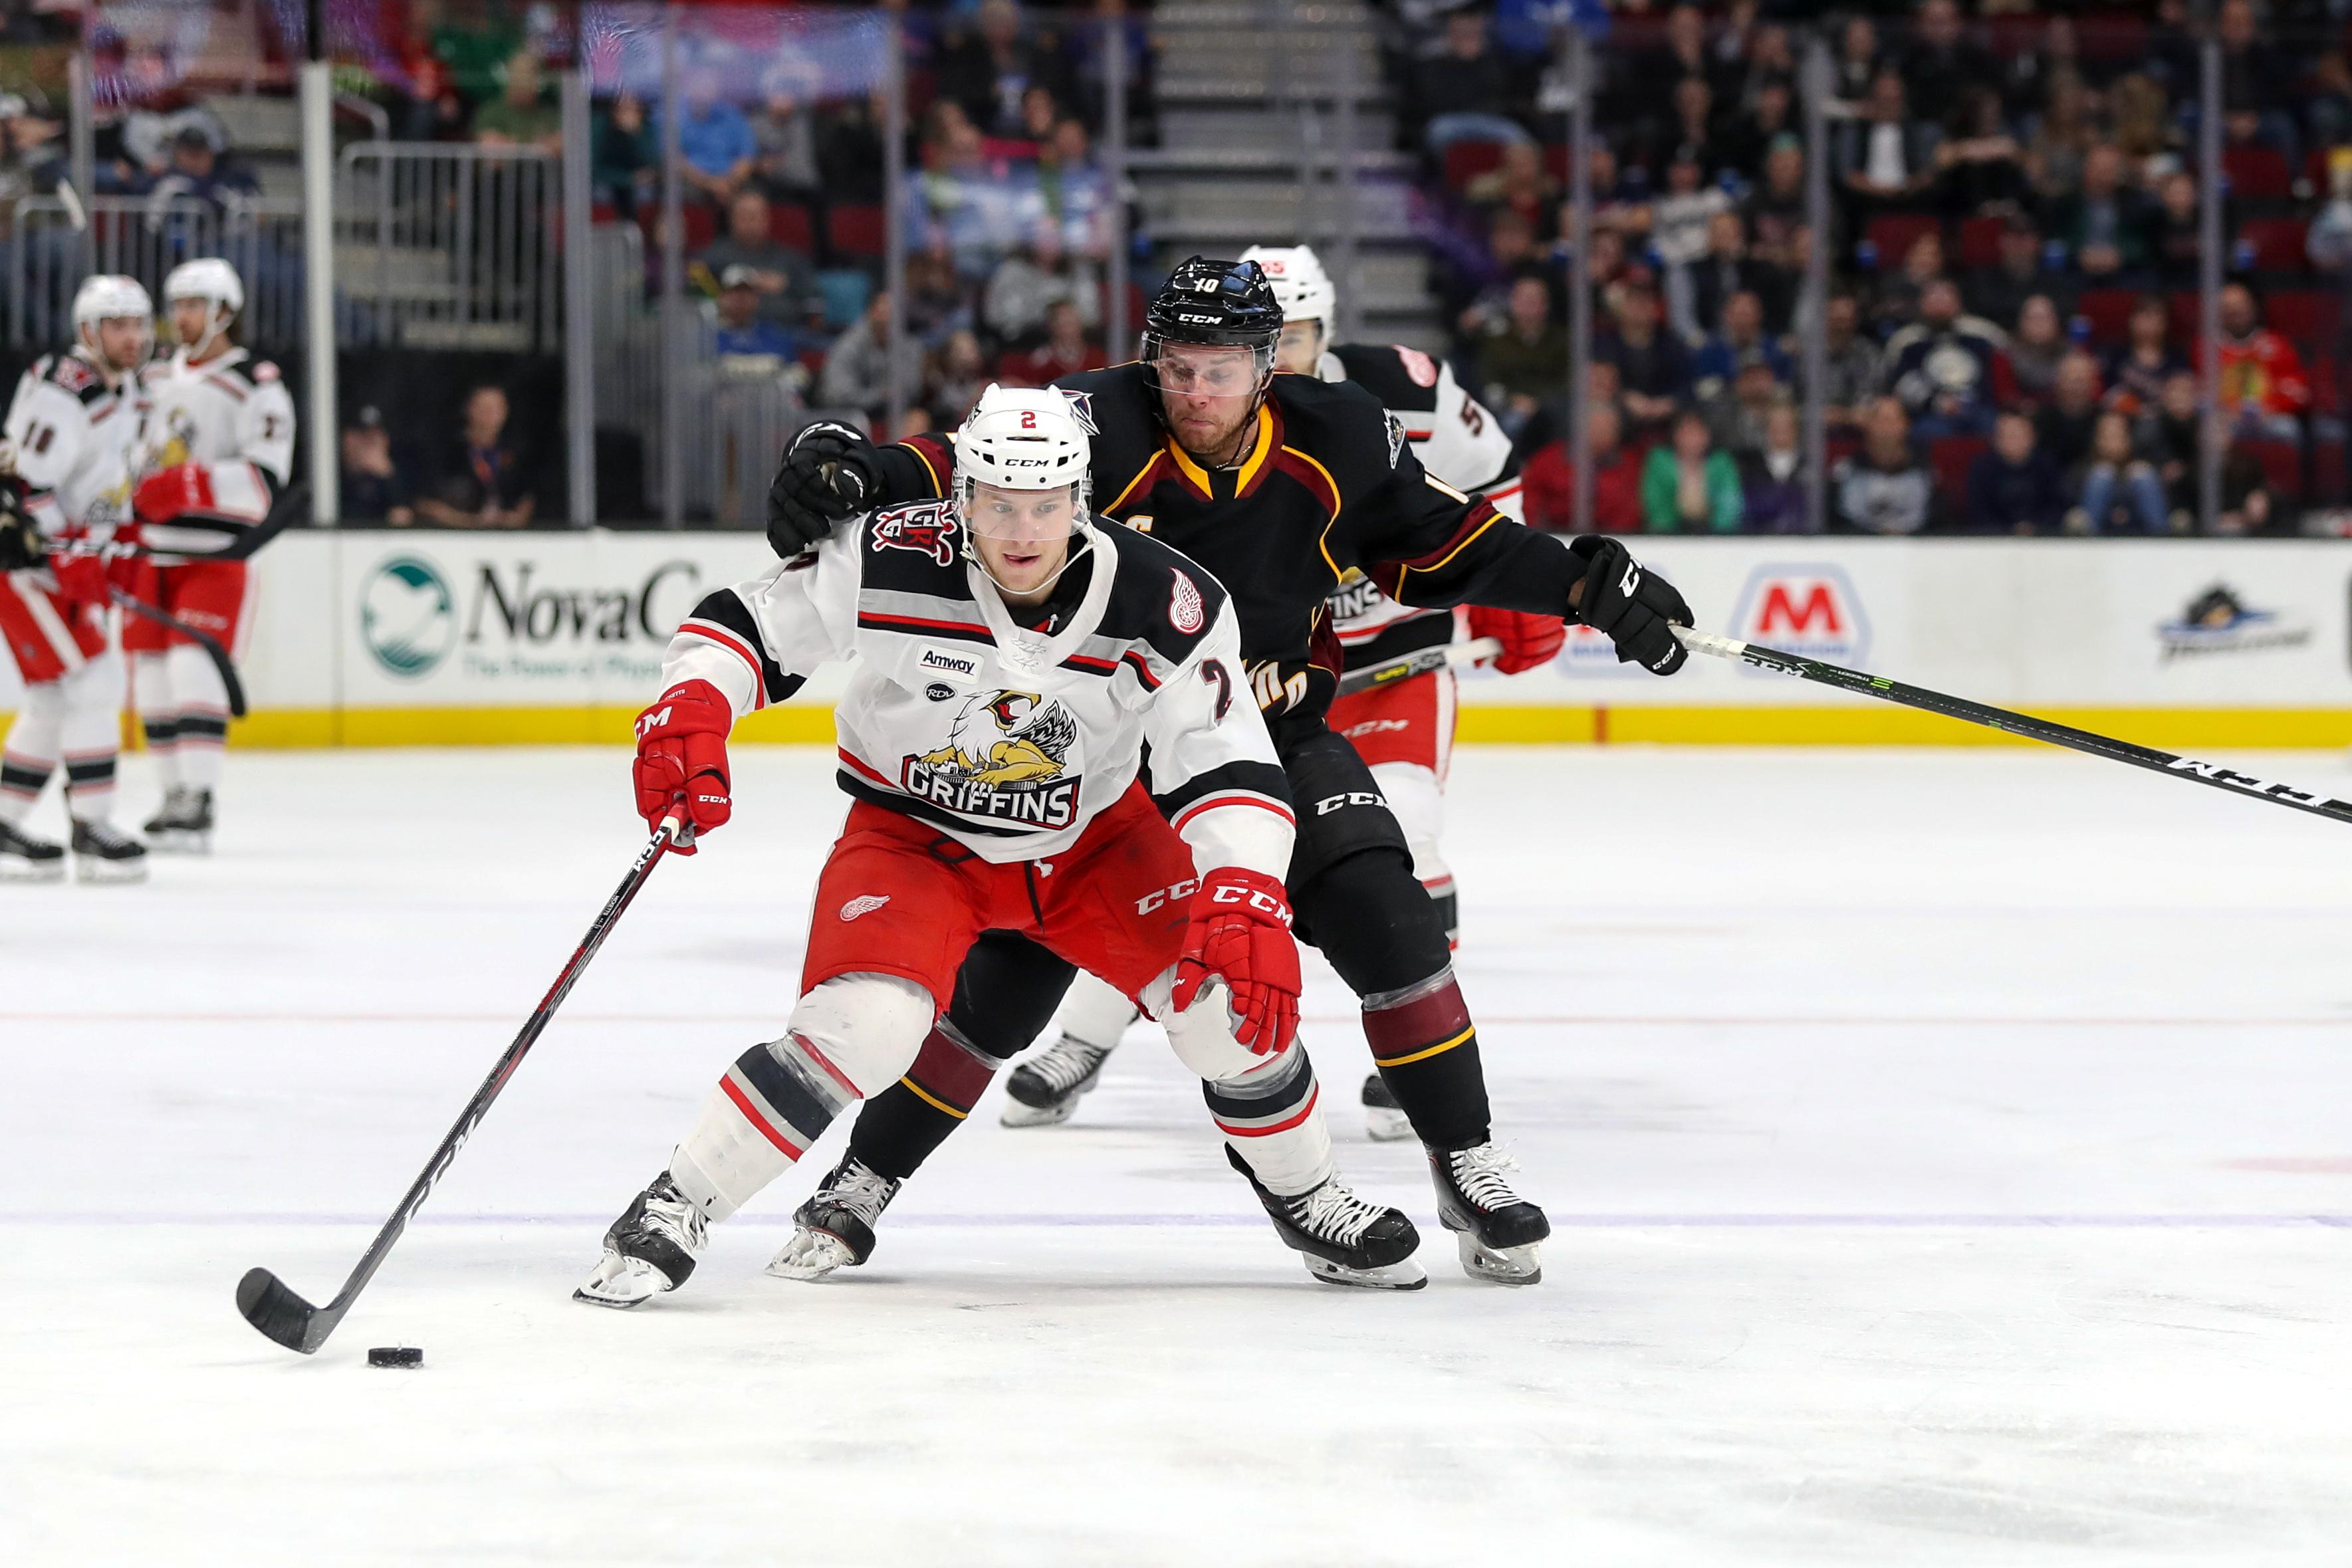 AHL: DEC 28 Grand Rapids Griffins at Cleveland Monsters